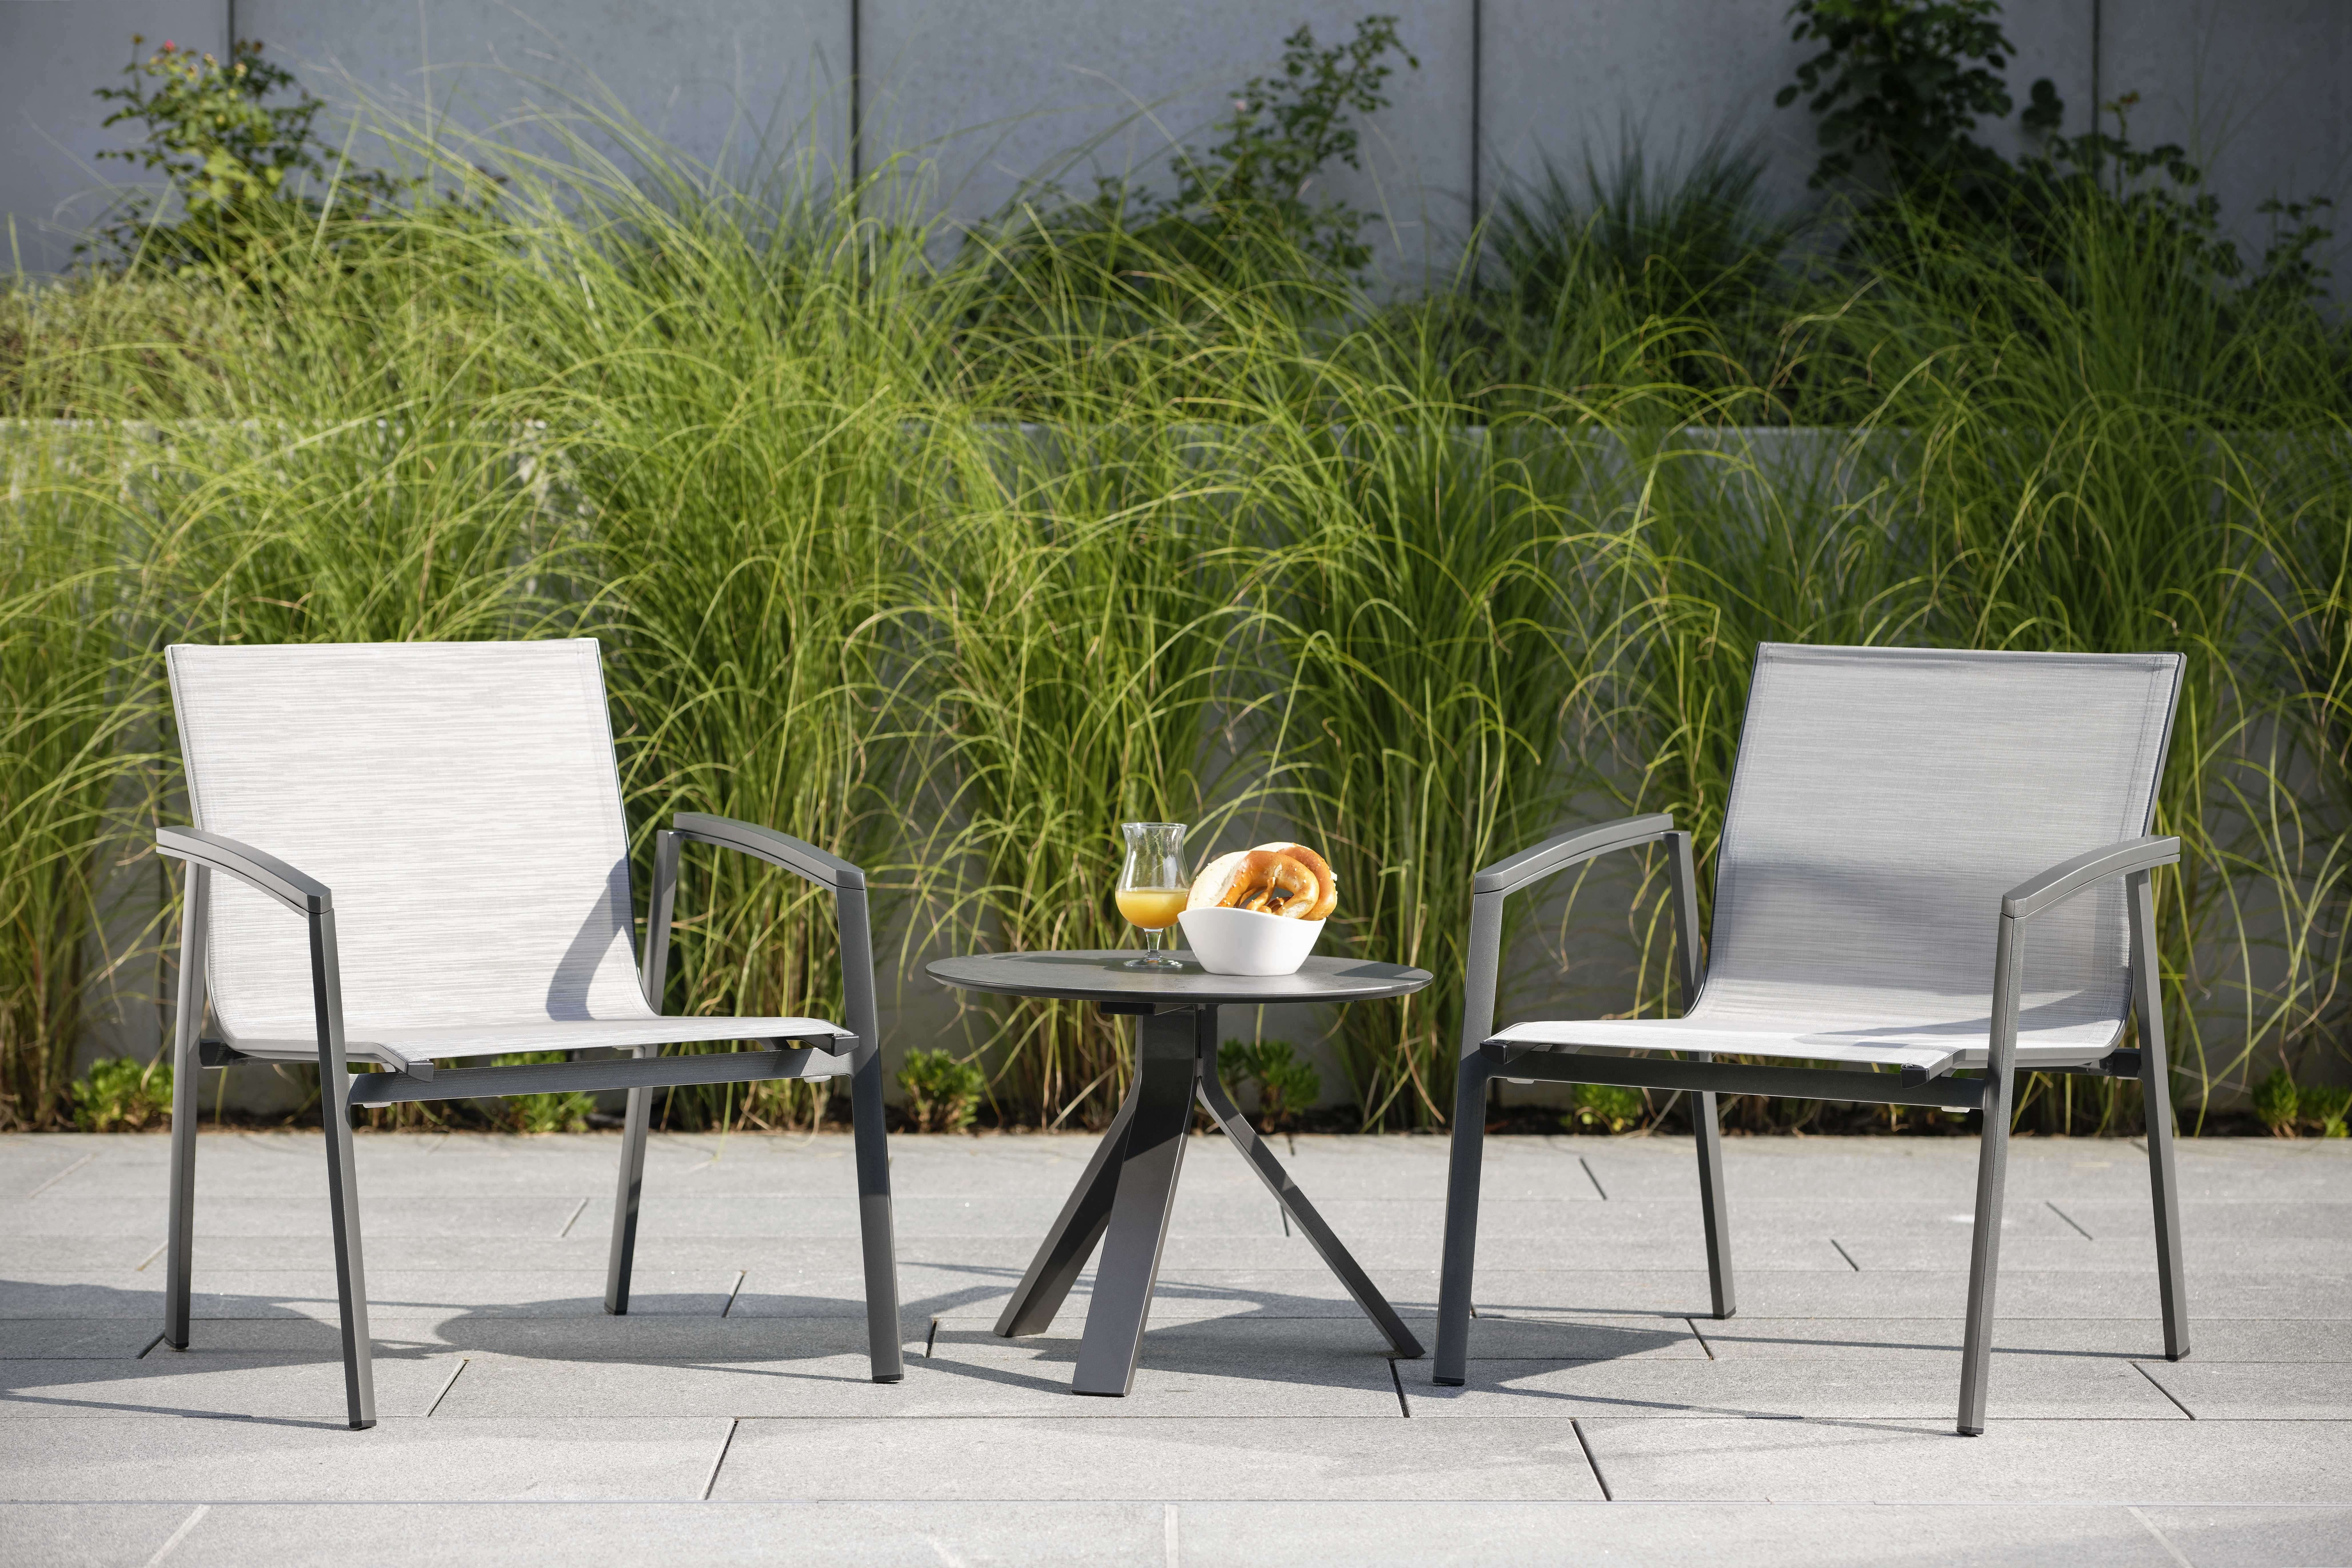 Garten Loungesessel Costa Mit Polyrattan Lounge Sessel Sessel Westwing